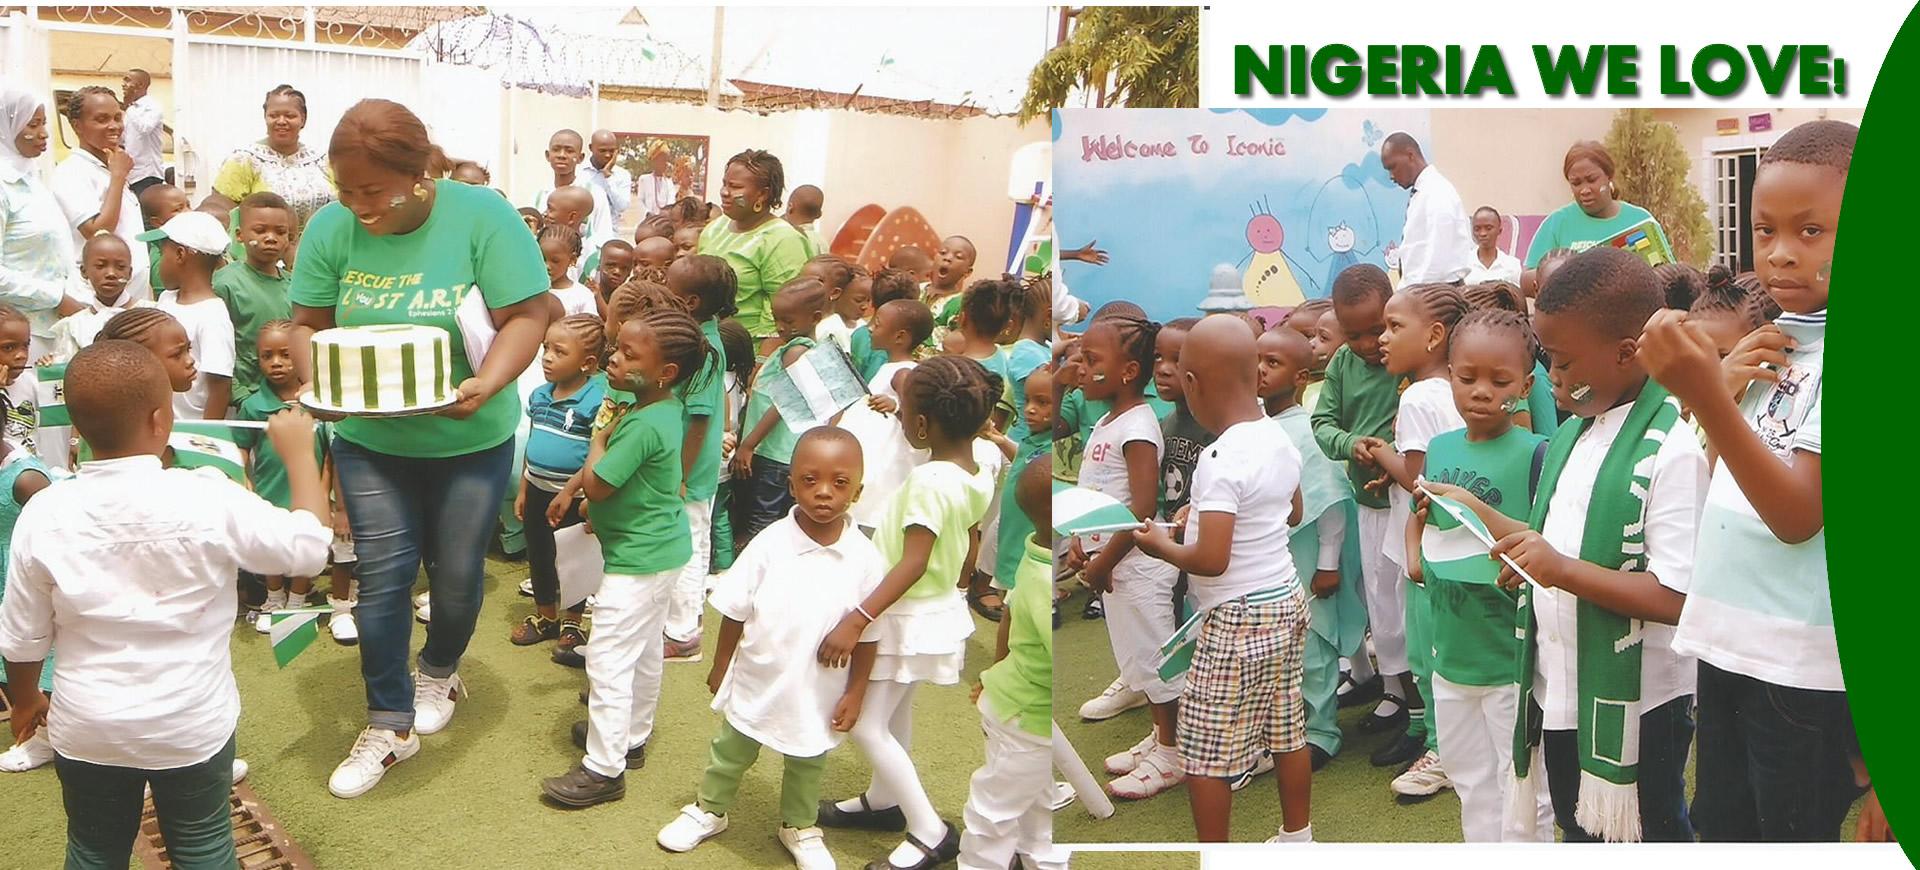 Nigeria we lov